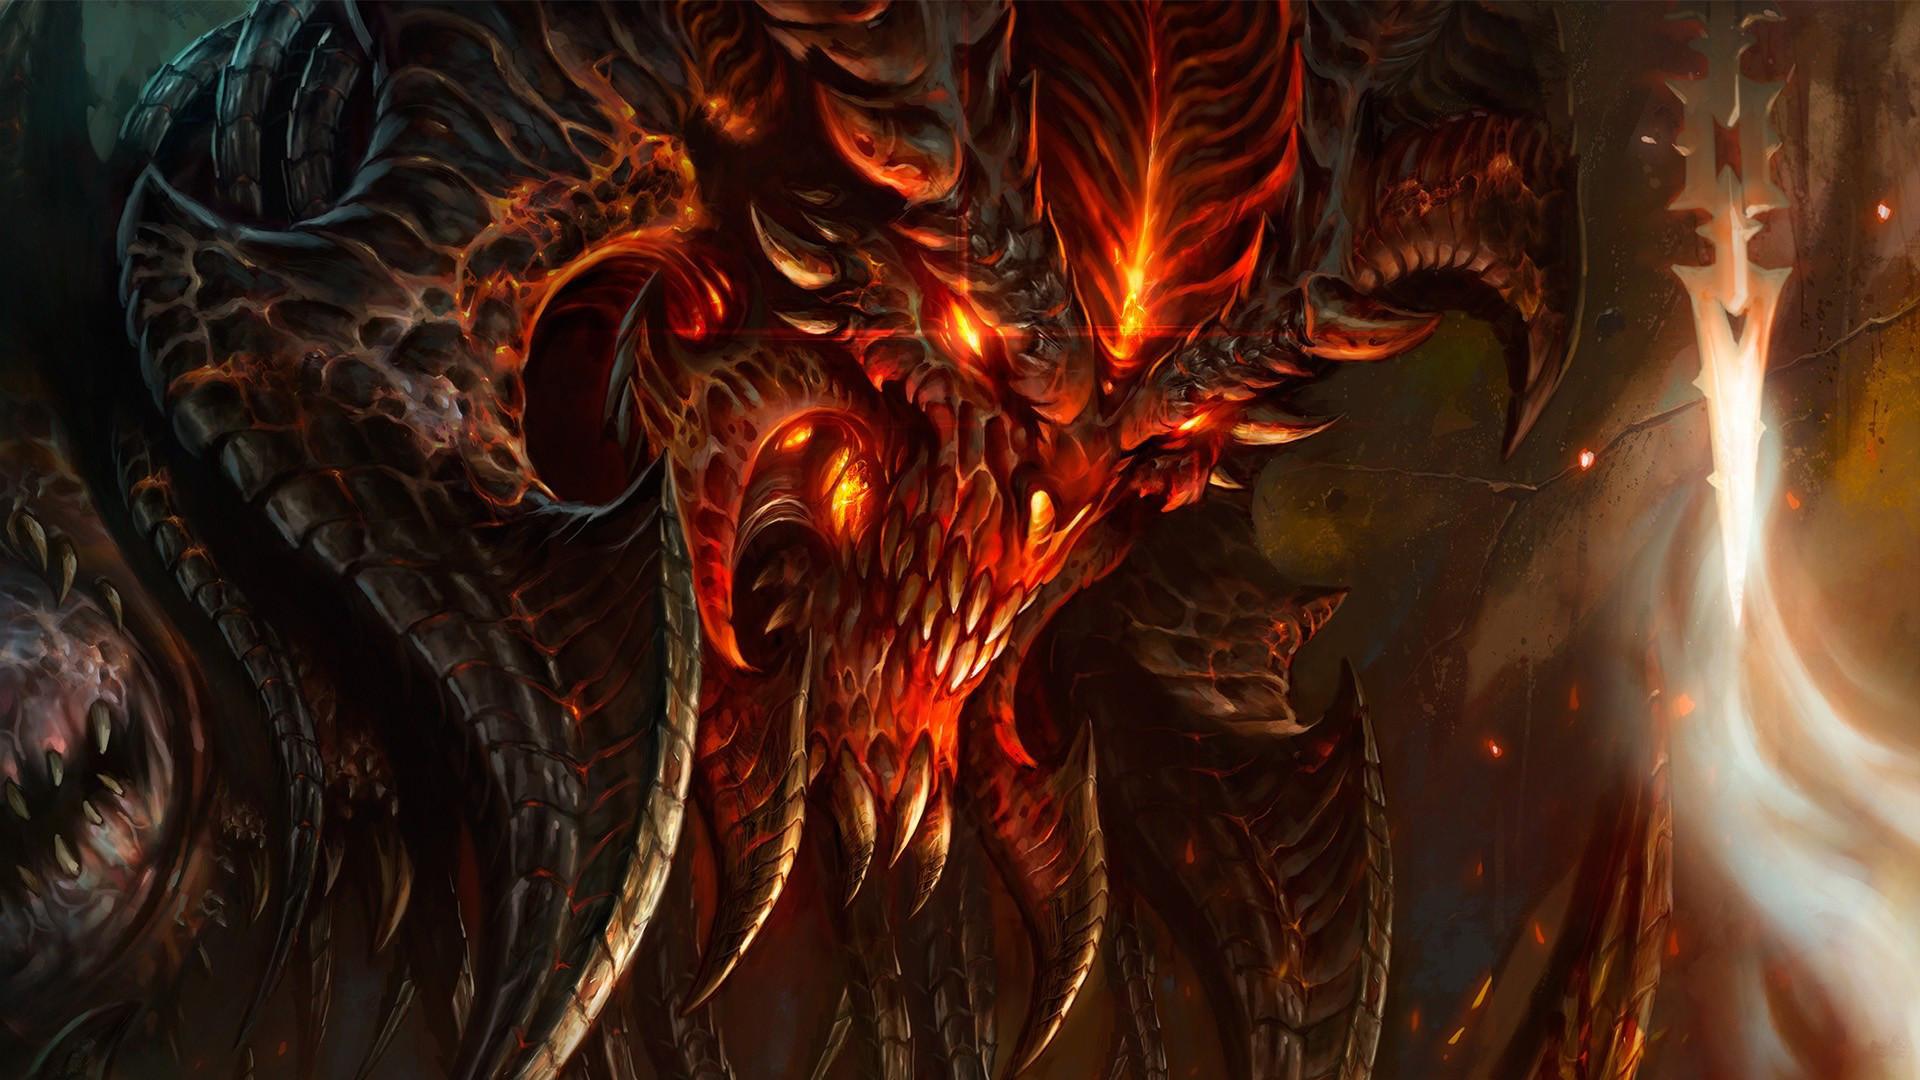 Diablo-III-epic-wallpaper.jpeg